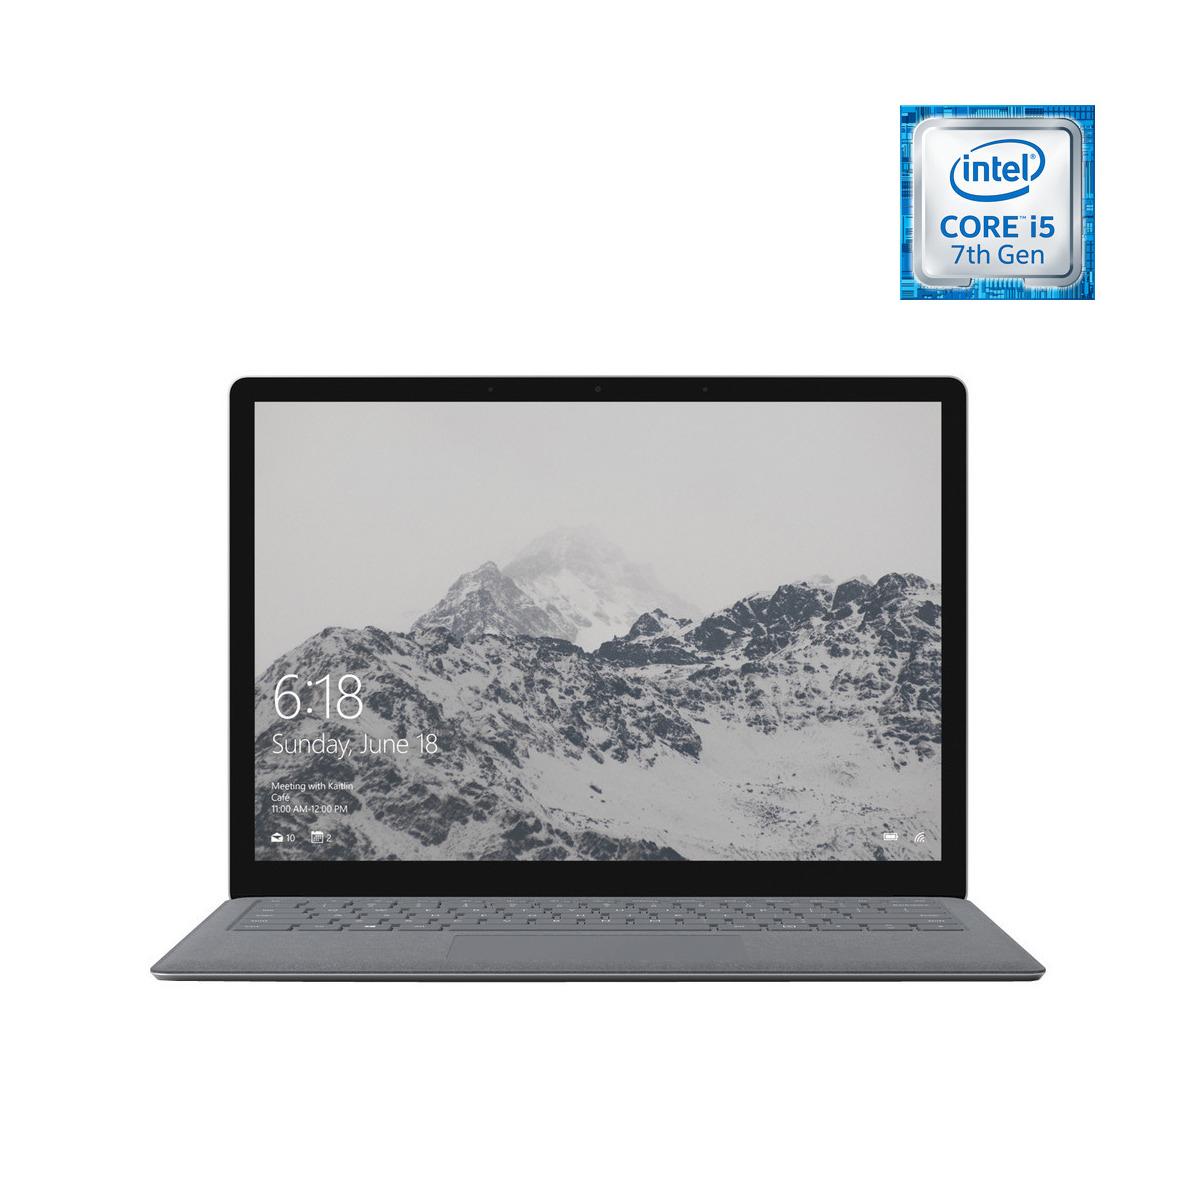 Microsoft Surface Laptop, i5, 4 GB, 128 GB SSD - Grado A